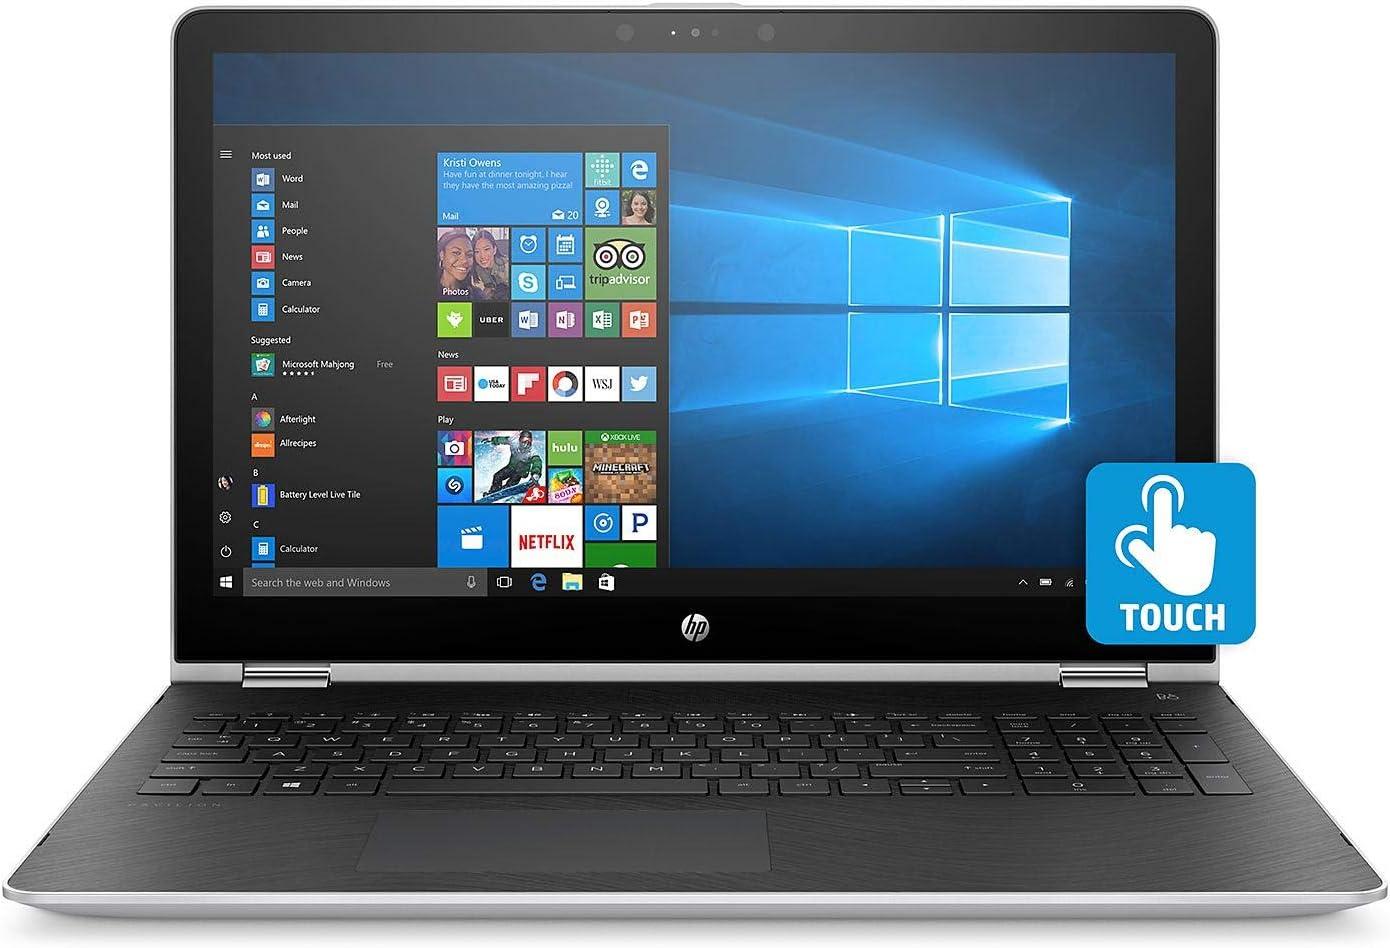 "Newest HP Pavilion X360 2-in-1 Convertible 15.6"" FHD IPS Multitouch Screen Laptop   Intel Quad Core i5-7200U   8GB RAM   512GB SSD   AMD Radeon 530 Dedicated Graphics   Backlit Keyboard   Windows 10"